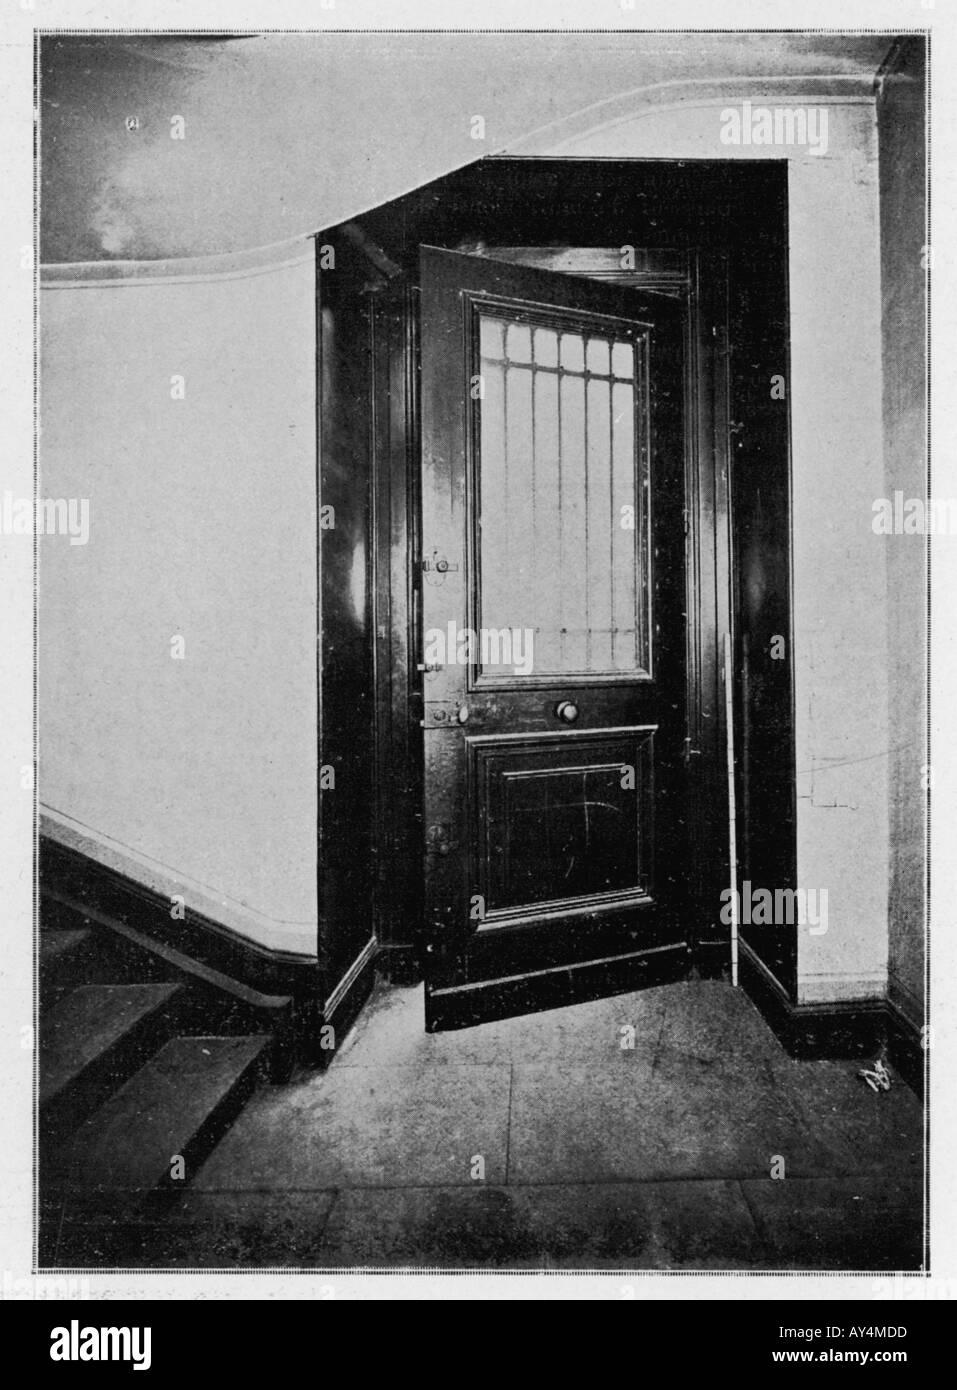 Mona Lisa Theft 1911 Stock Photo